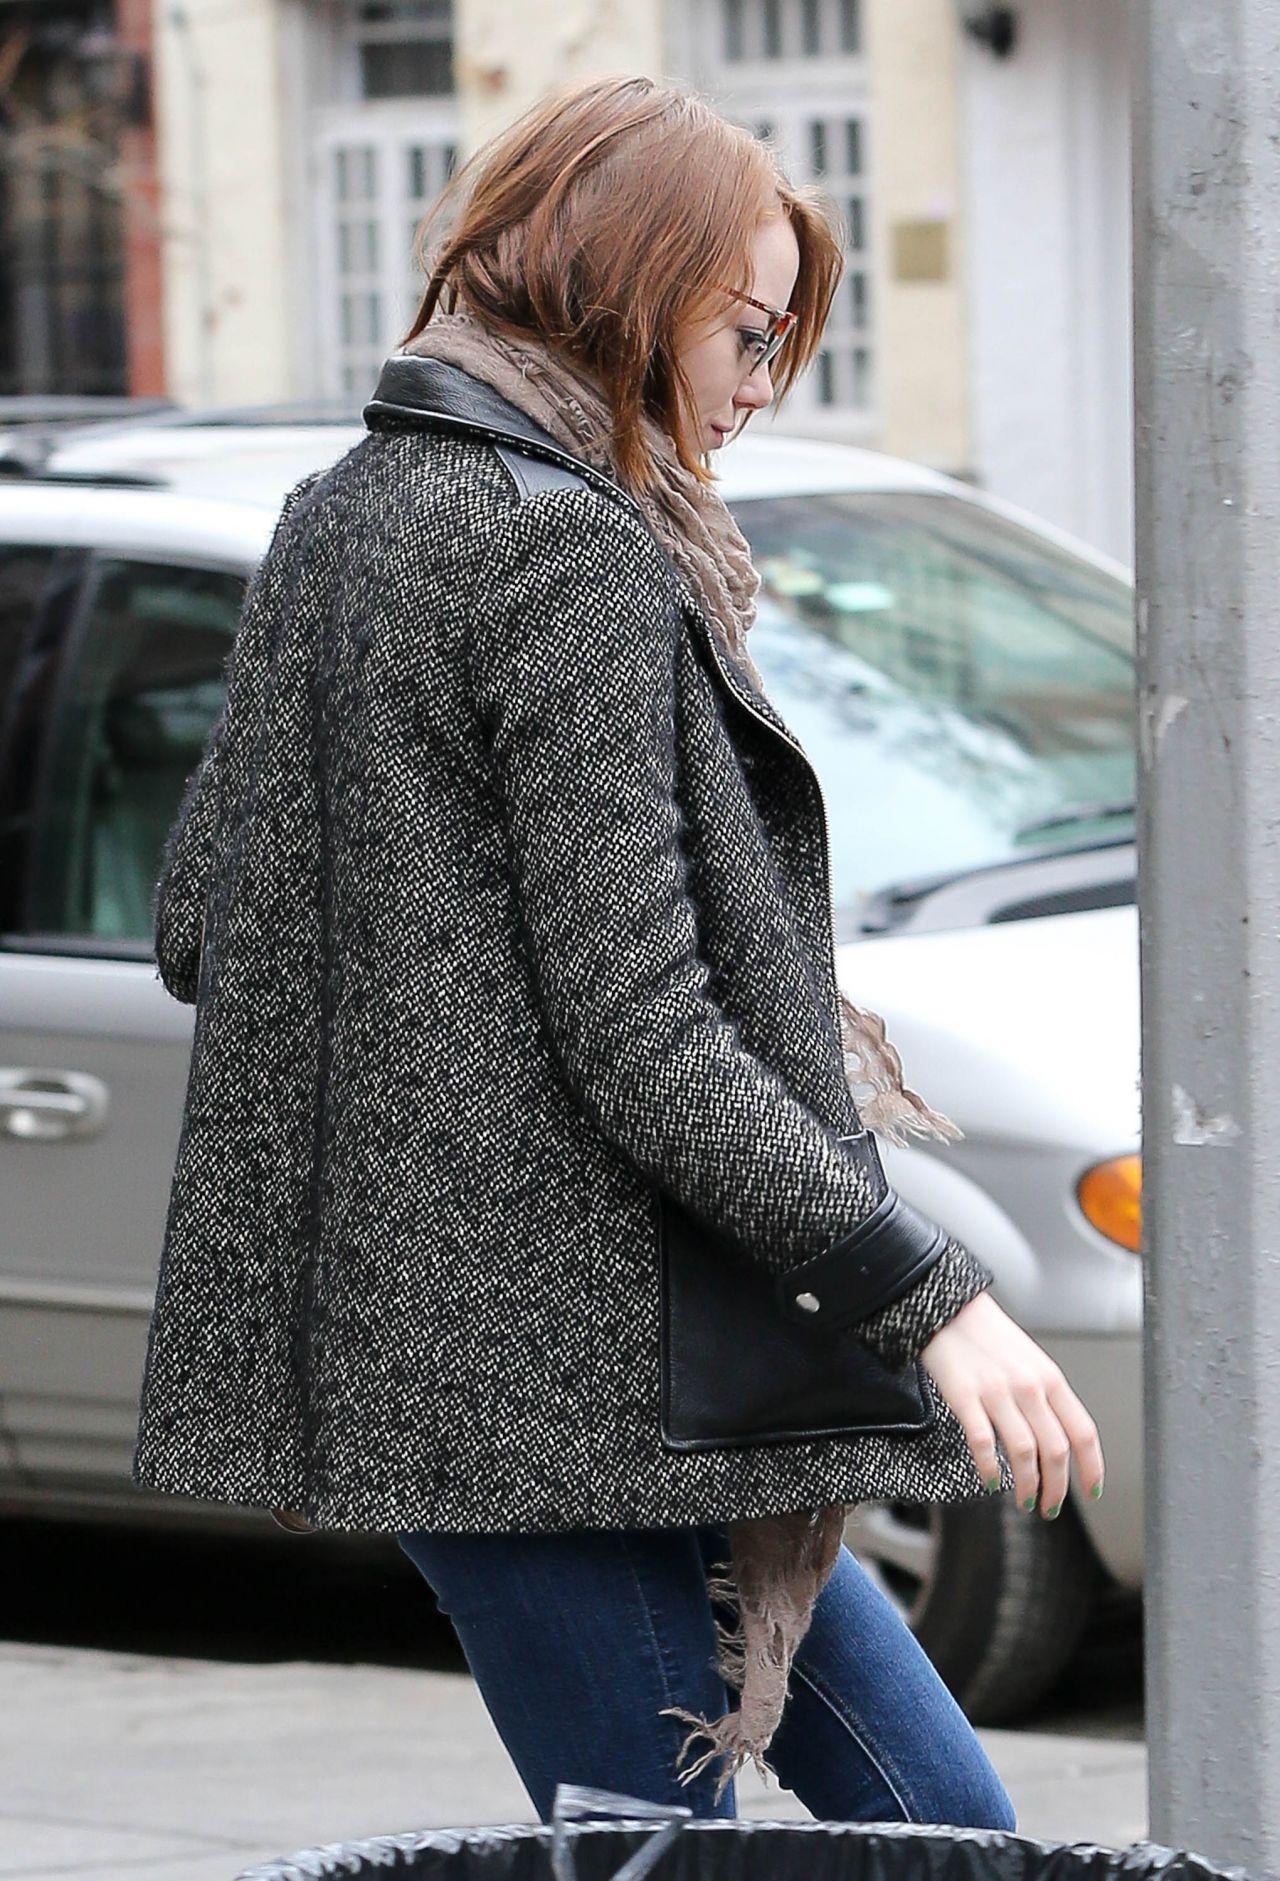 Emma Stone - Leaving Cafe Cluny in New York City, January 2015